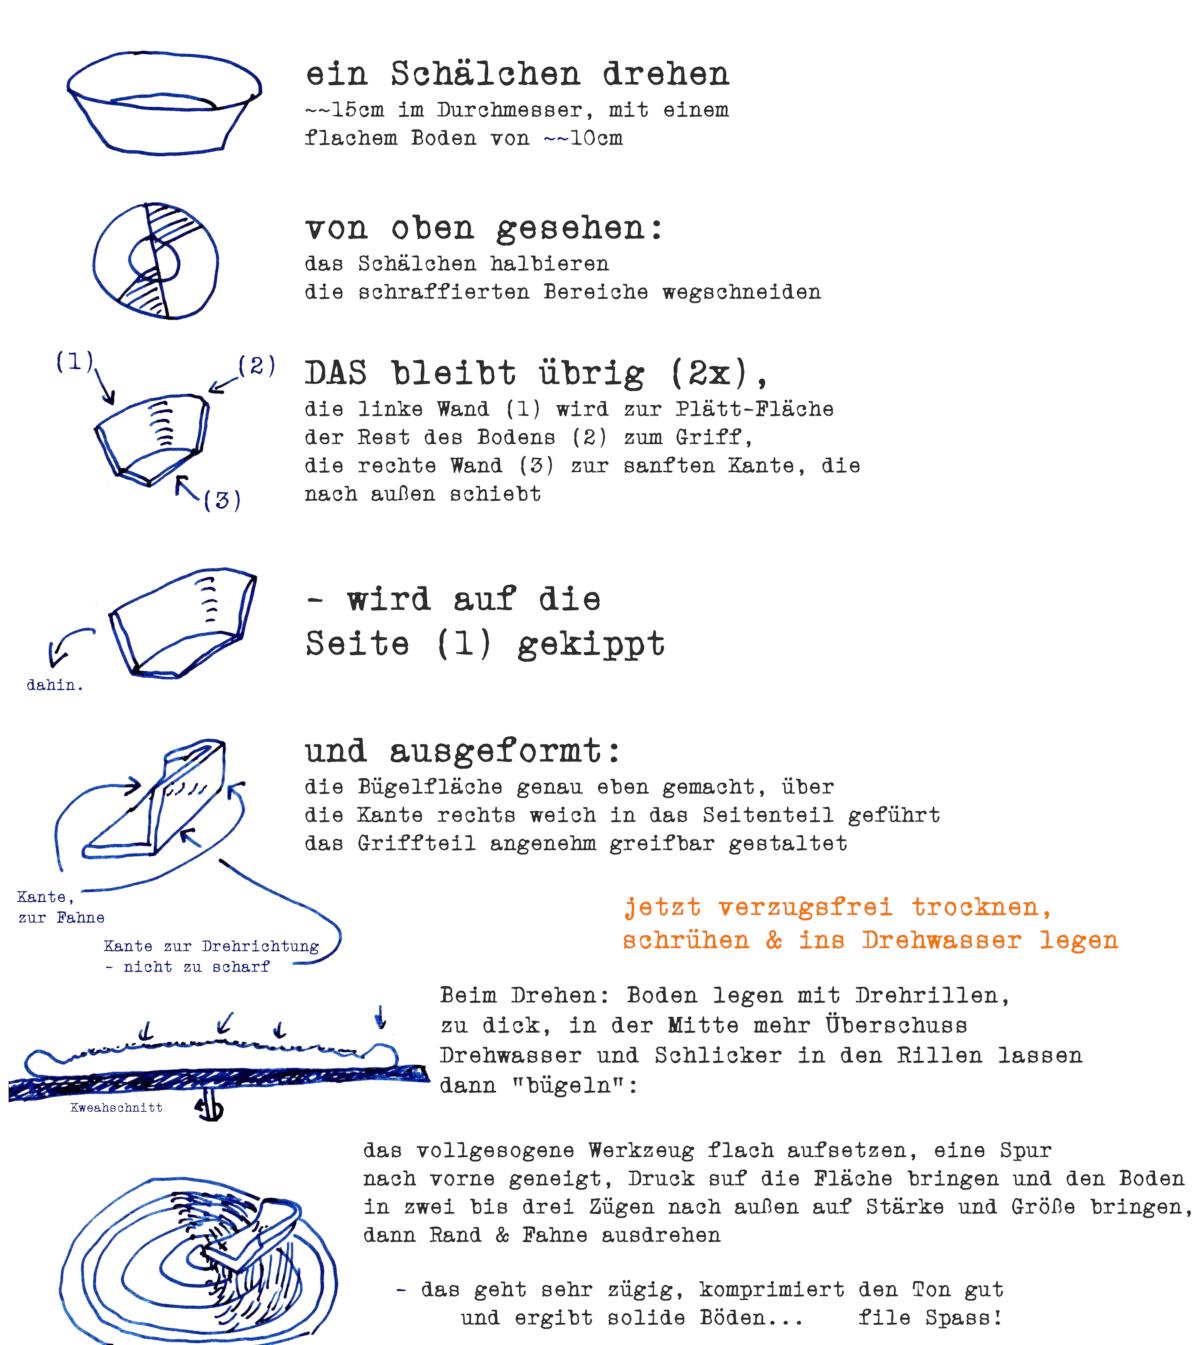 l'outil de Vallauris - Anleitung